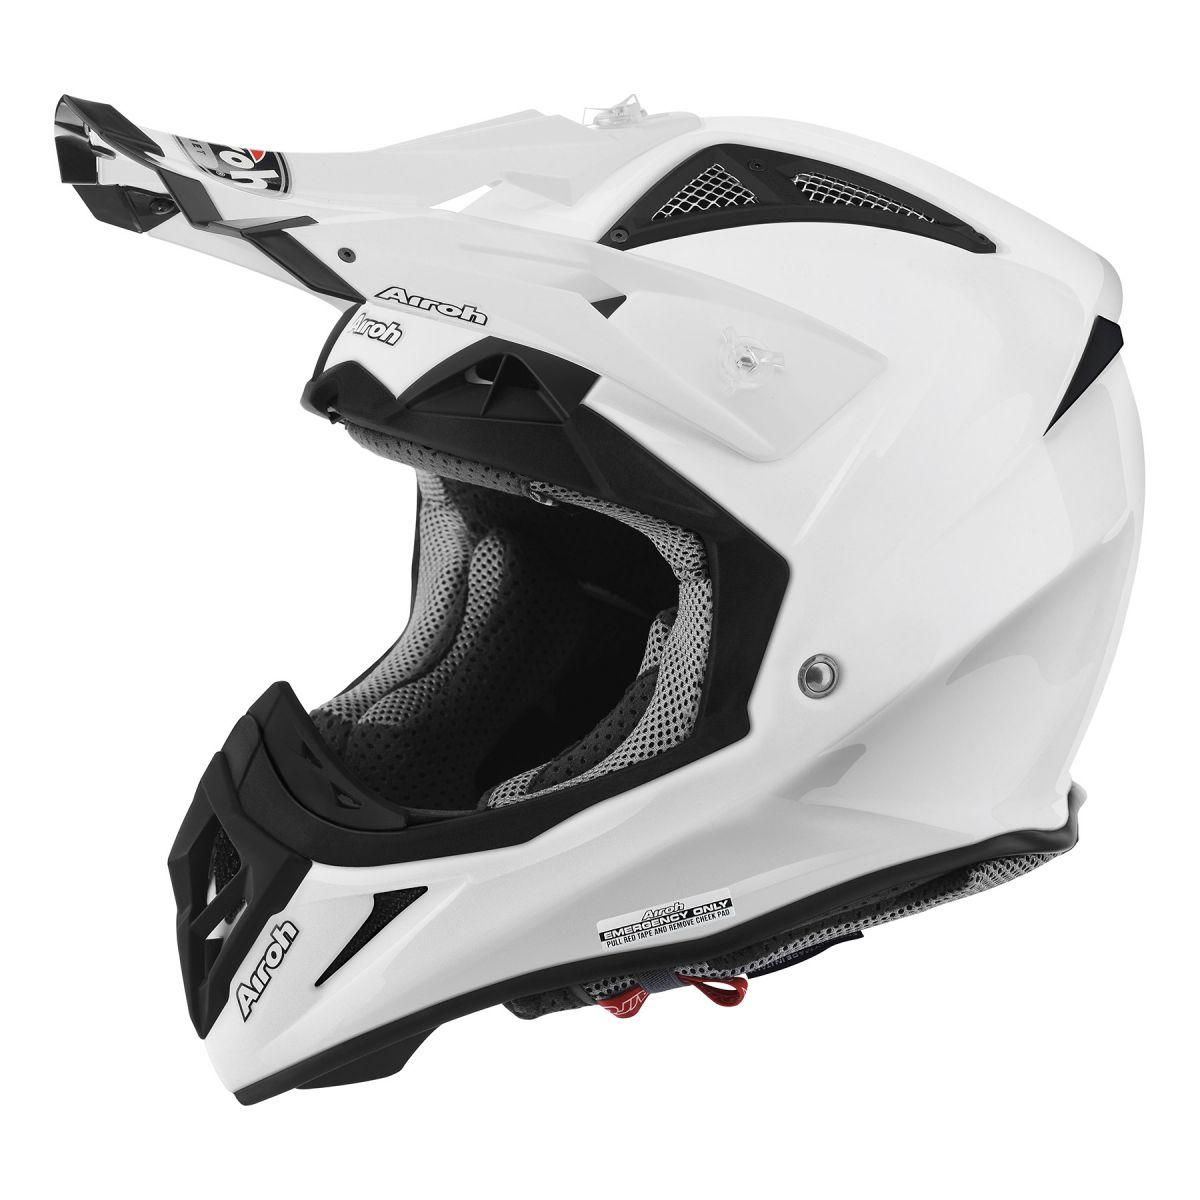 Airoh - Aviator 2.2 White шлем, белый